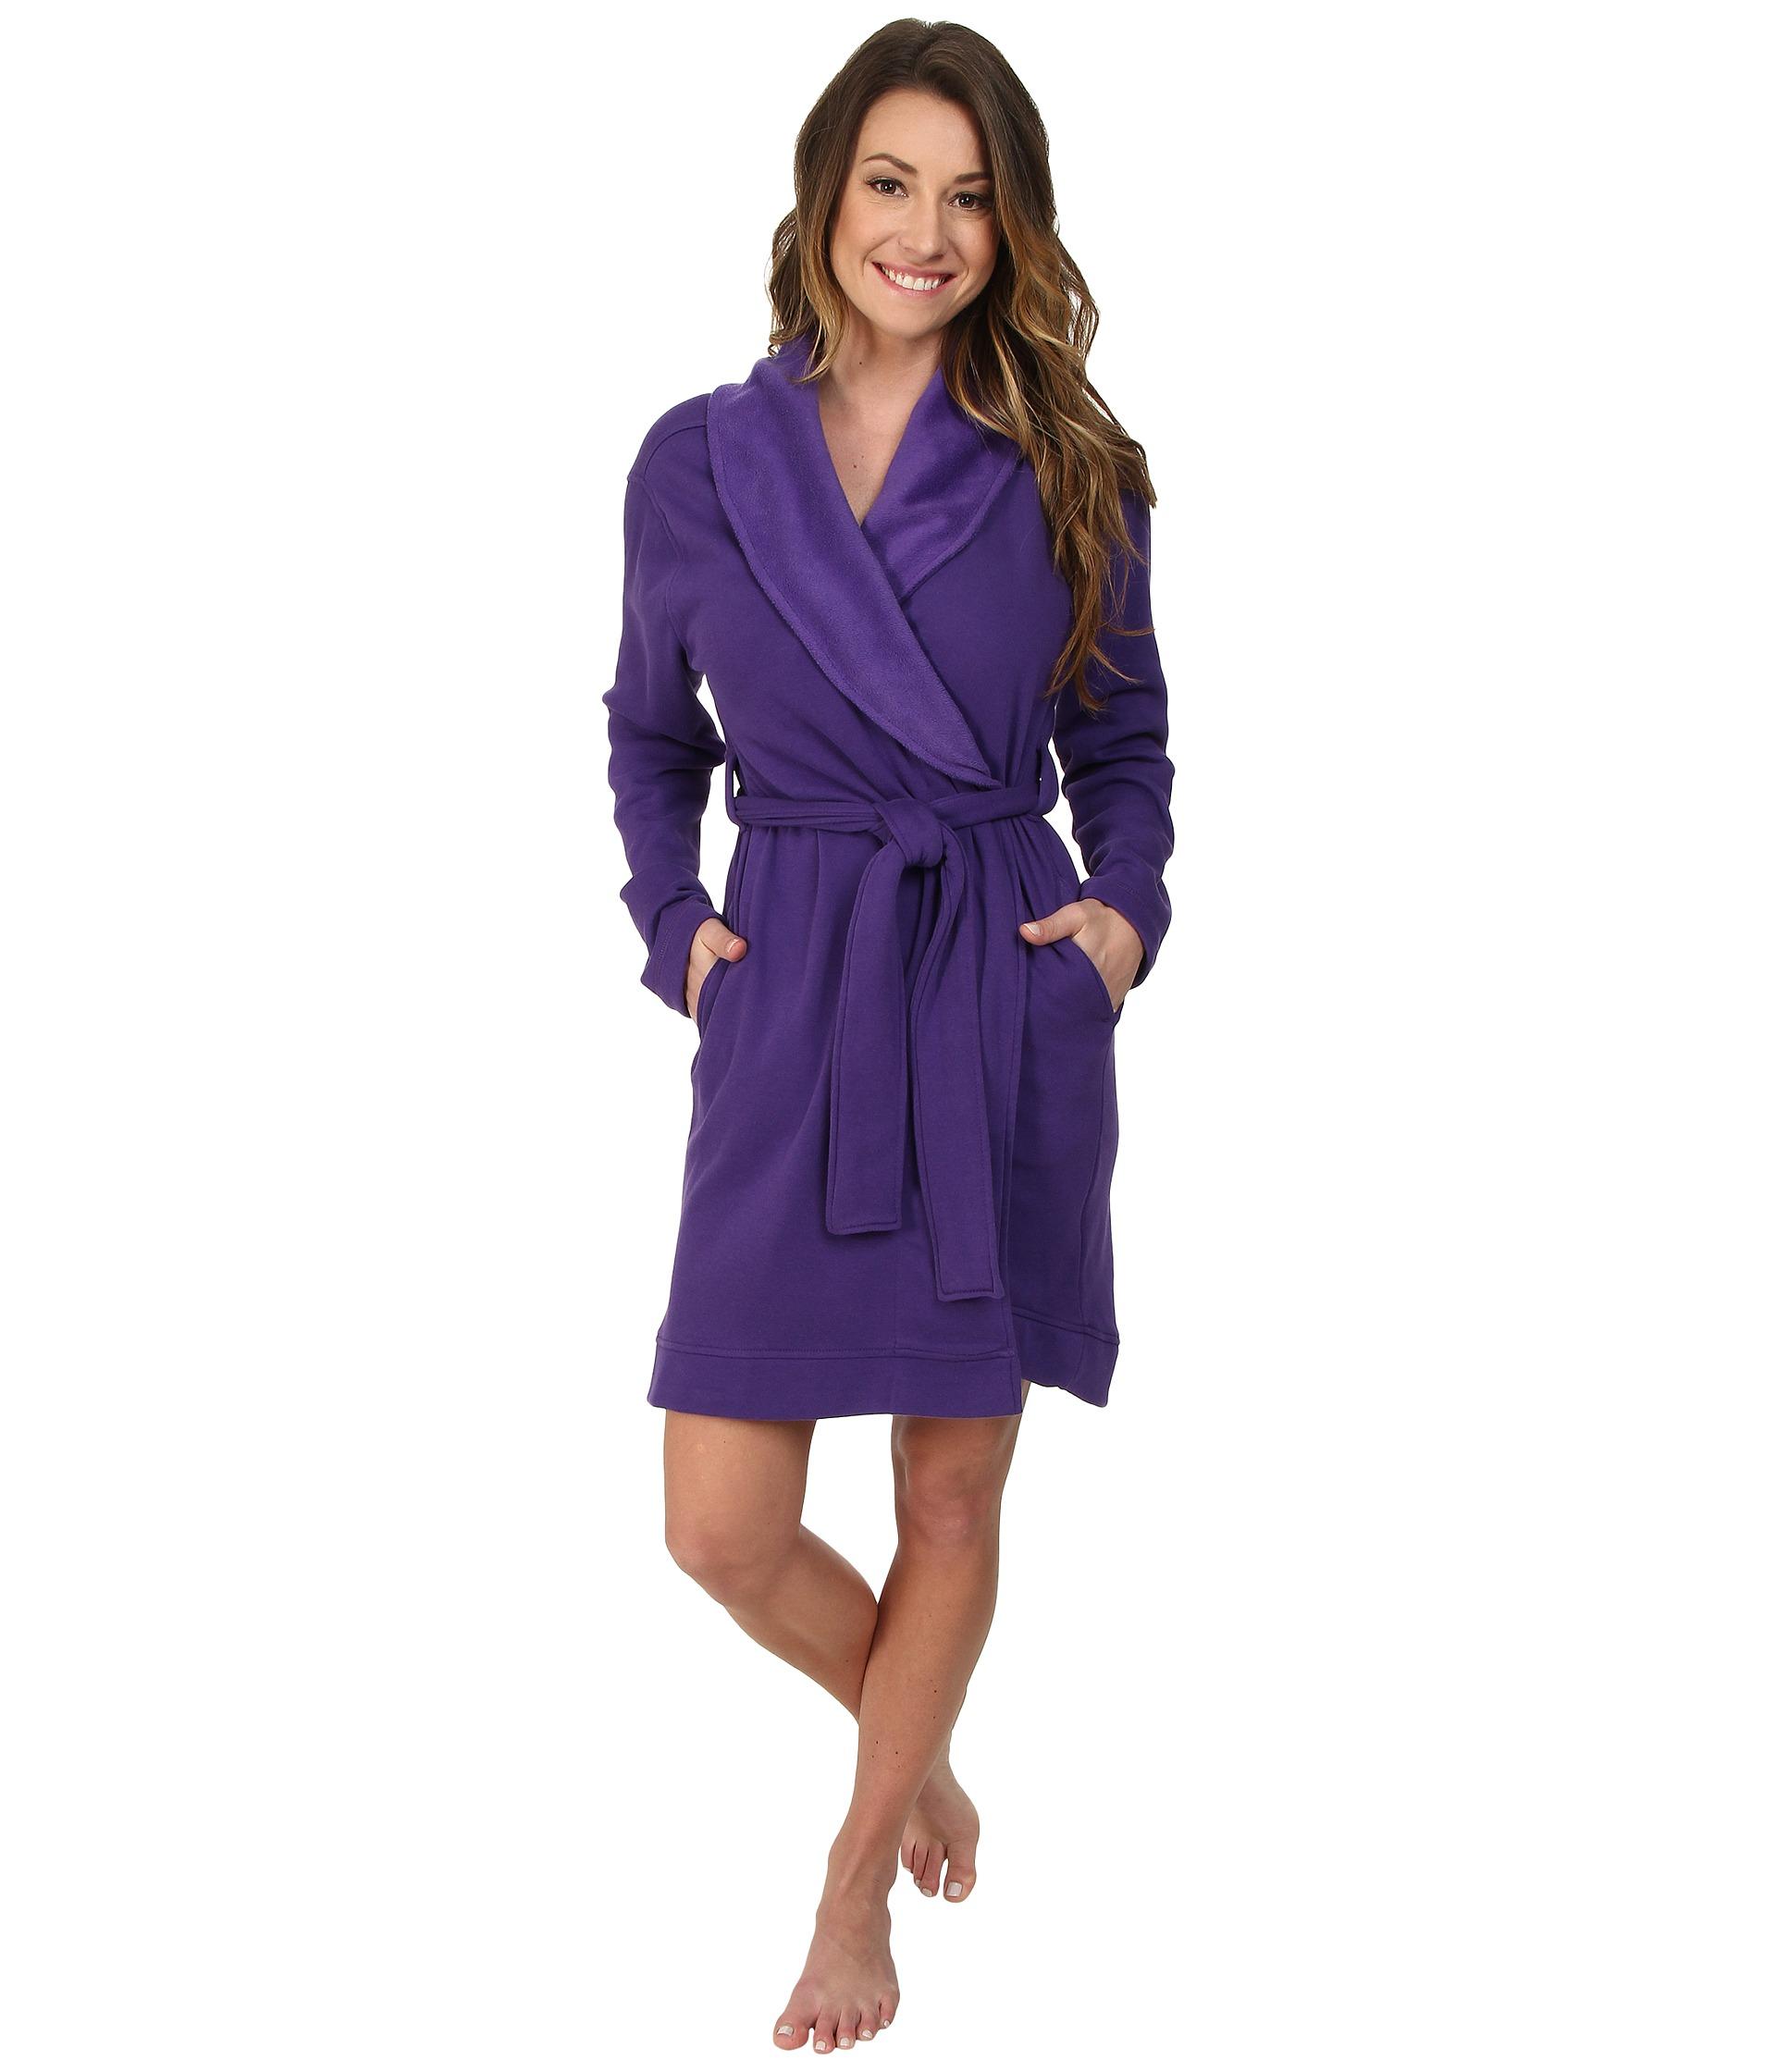 lyst ugg blanche robe in purple. Black Bedroom Furniture Sets. Home Design Ideas